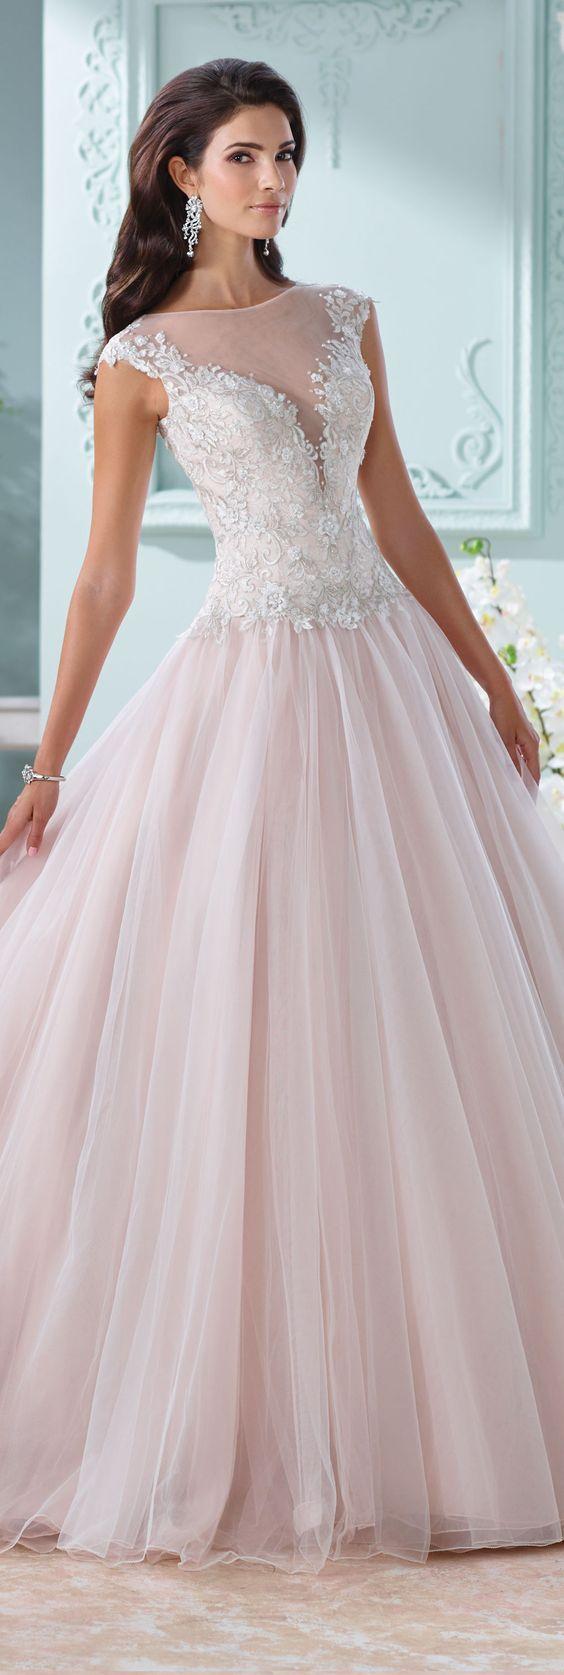 Wedding - Wedding Dress With Illusion Neckline